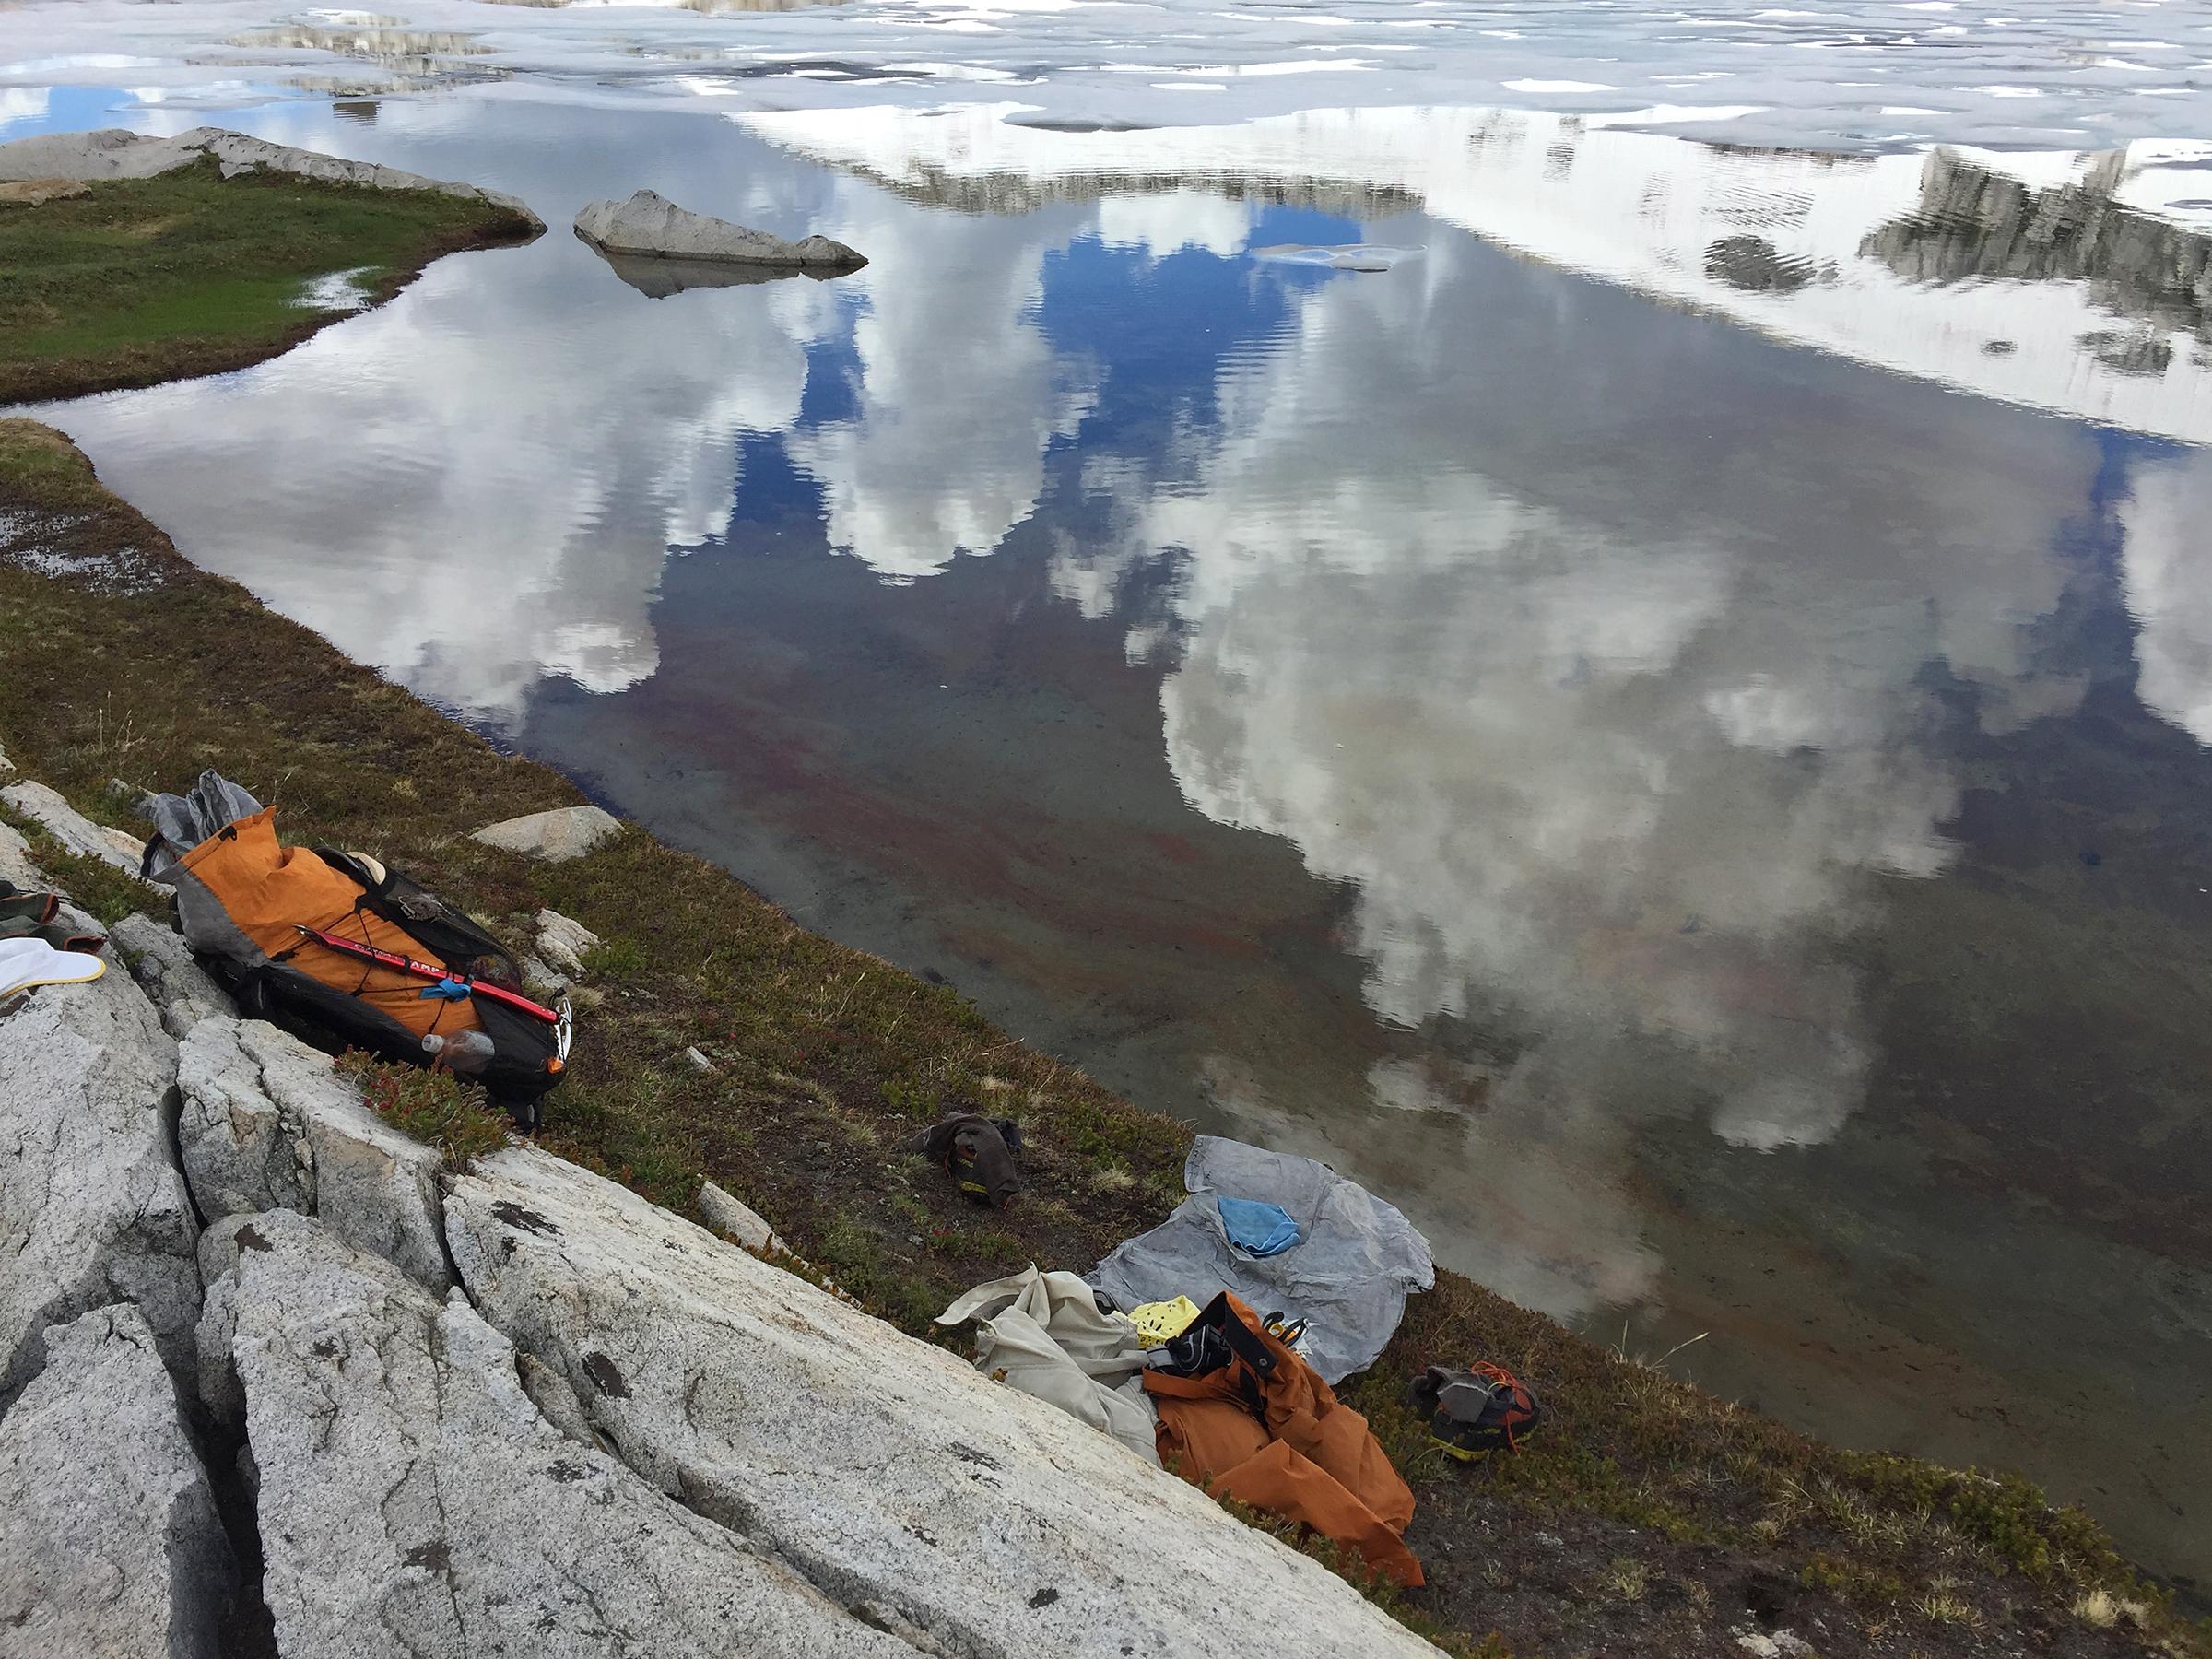 trailname-backstroketrailname-backstroke-sierra-high-route-2017_blue lake-_0167.jpg